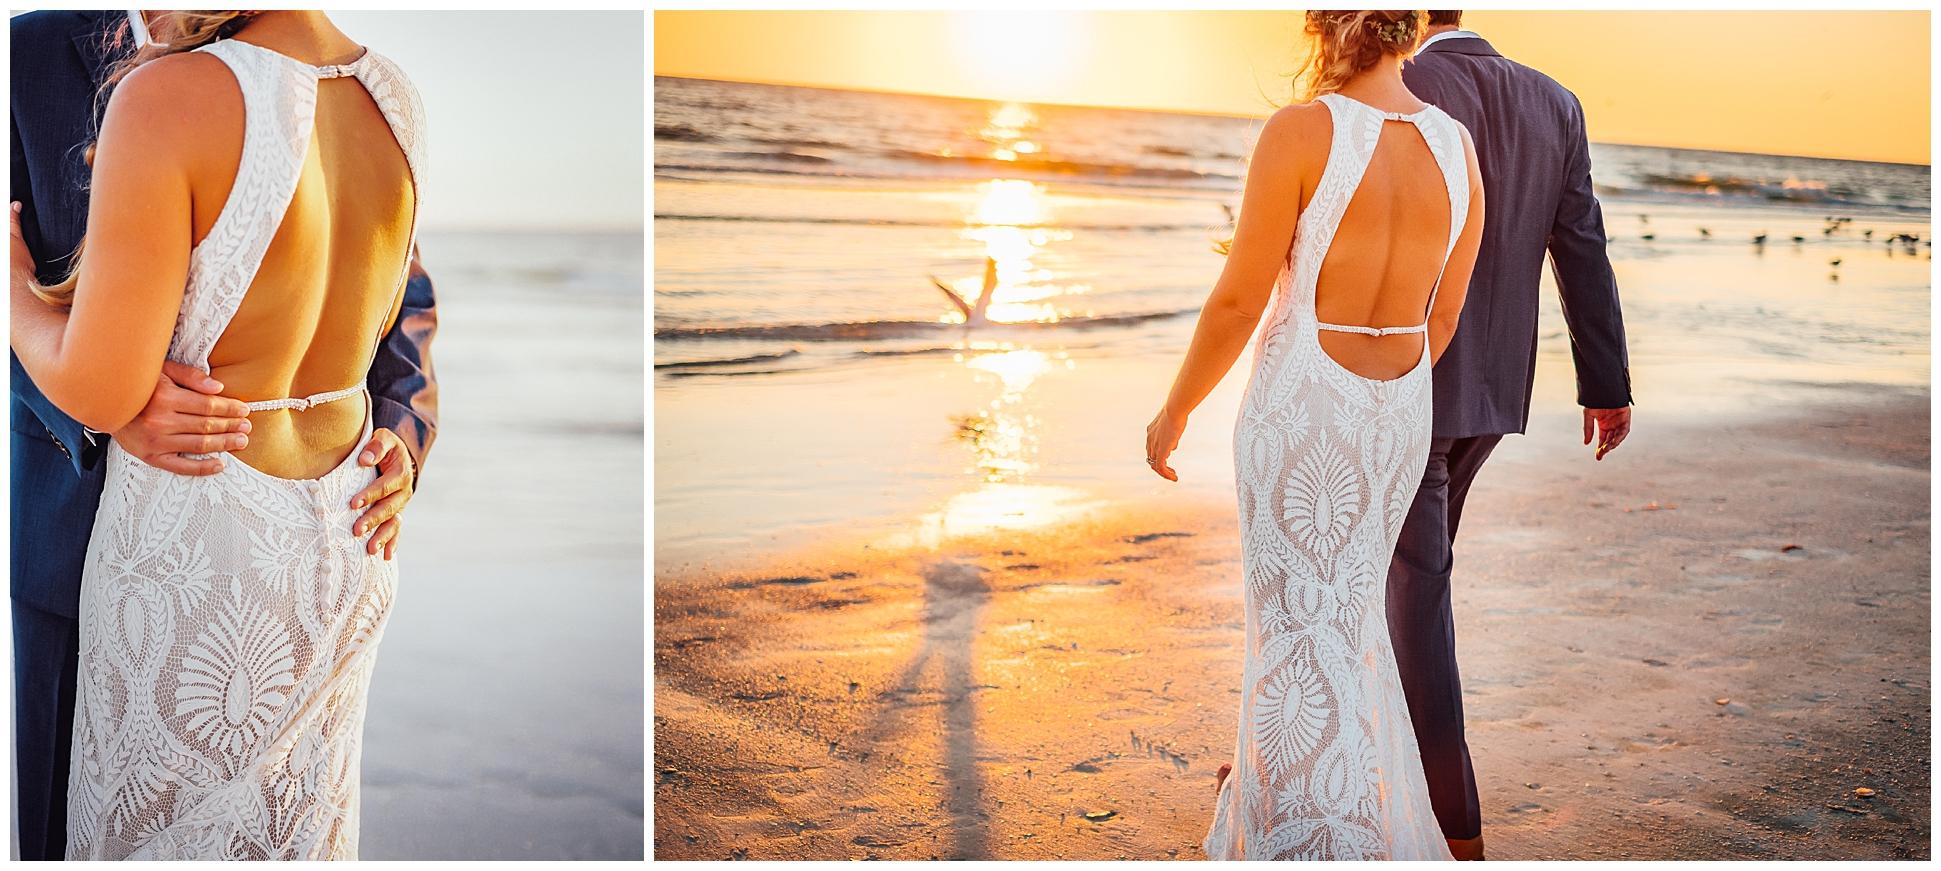 medium-format-film-vs-digital-wedding-photography-florida-beach_0027.jpg